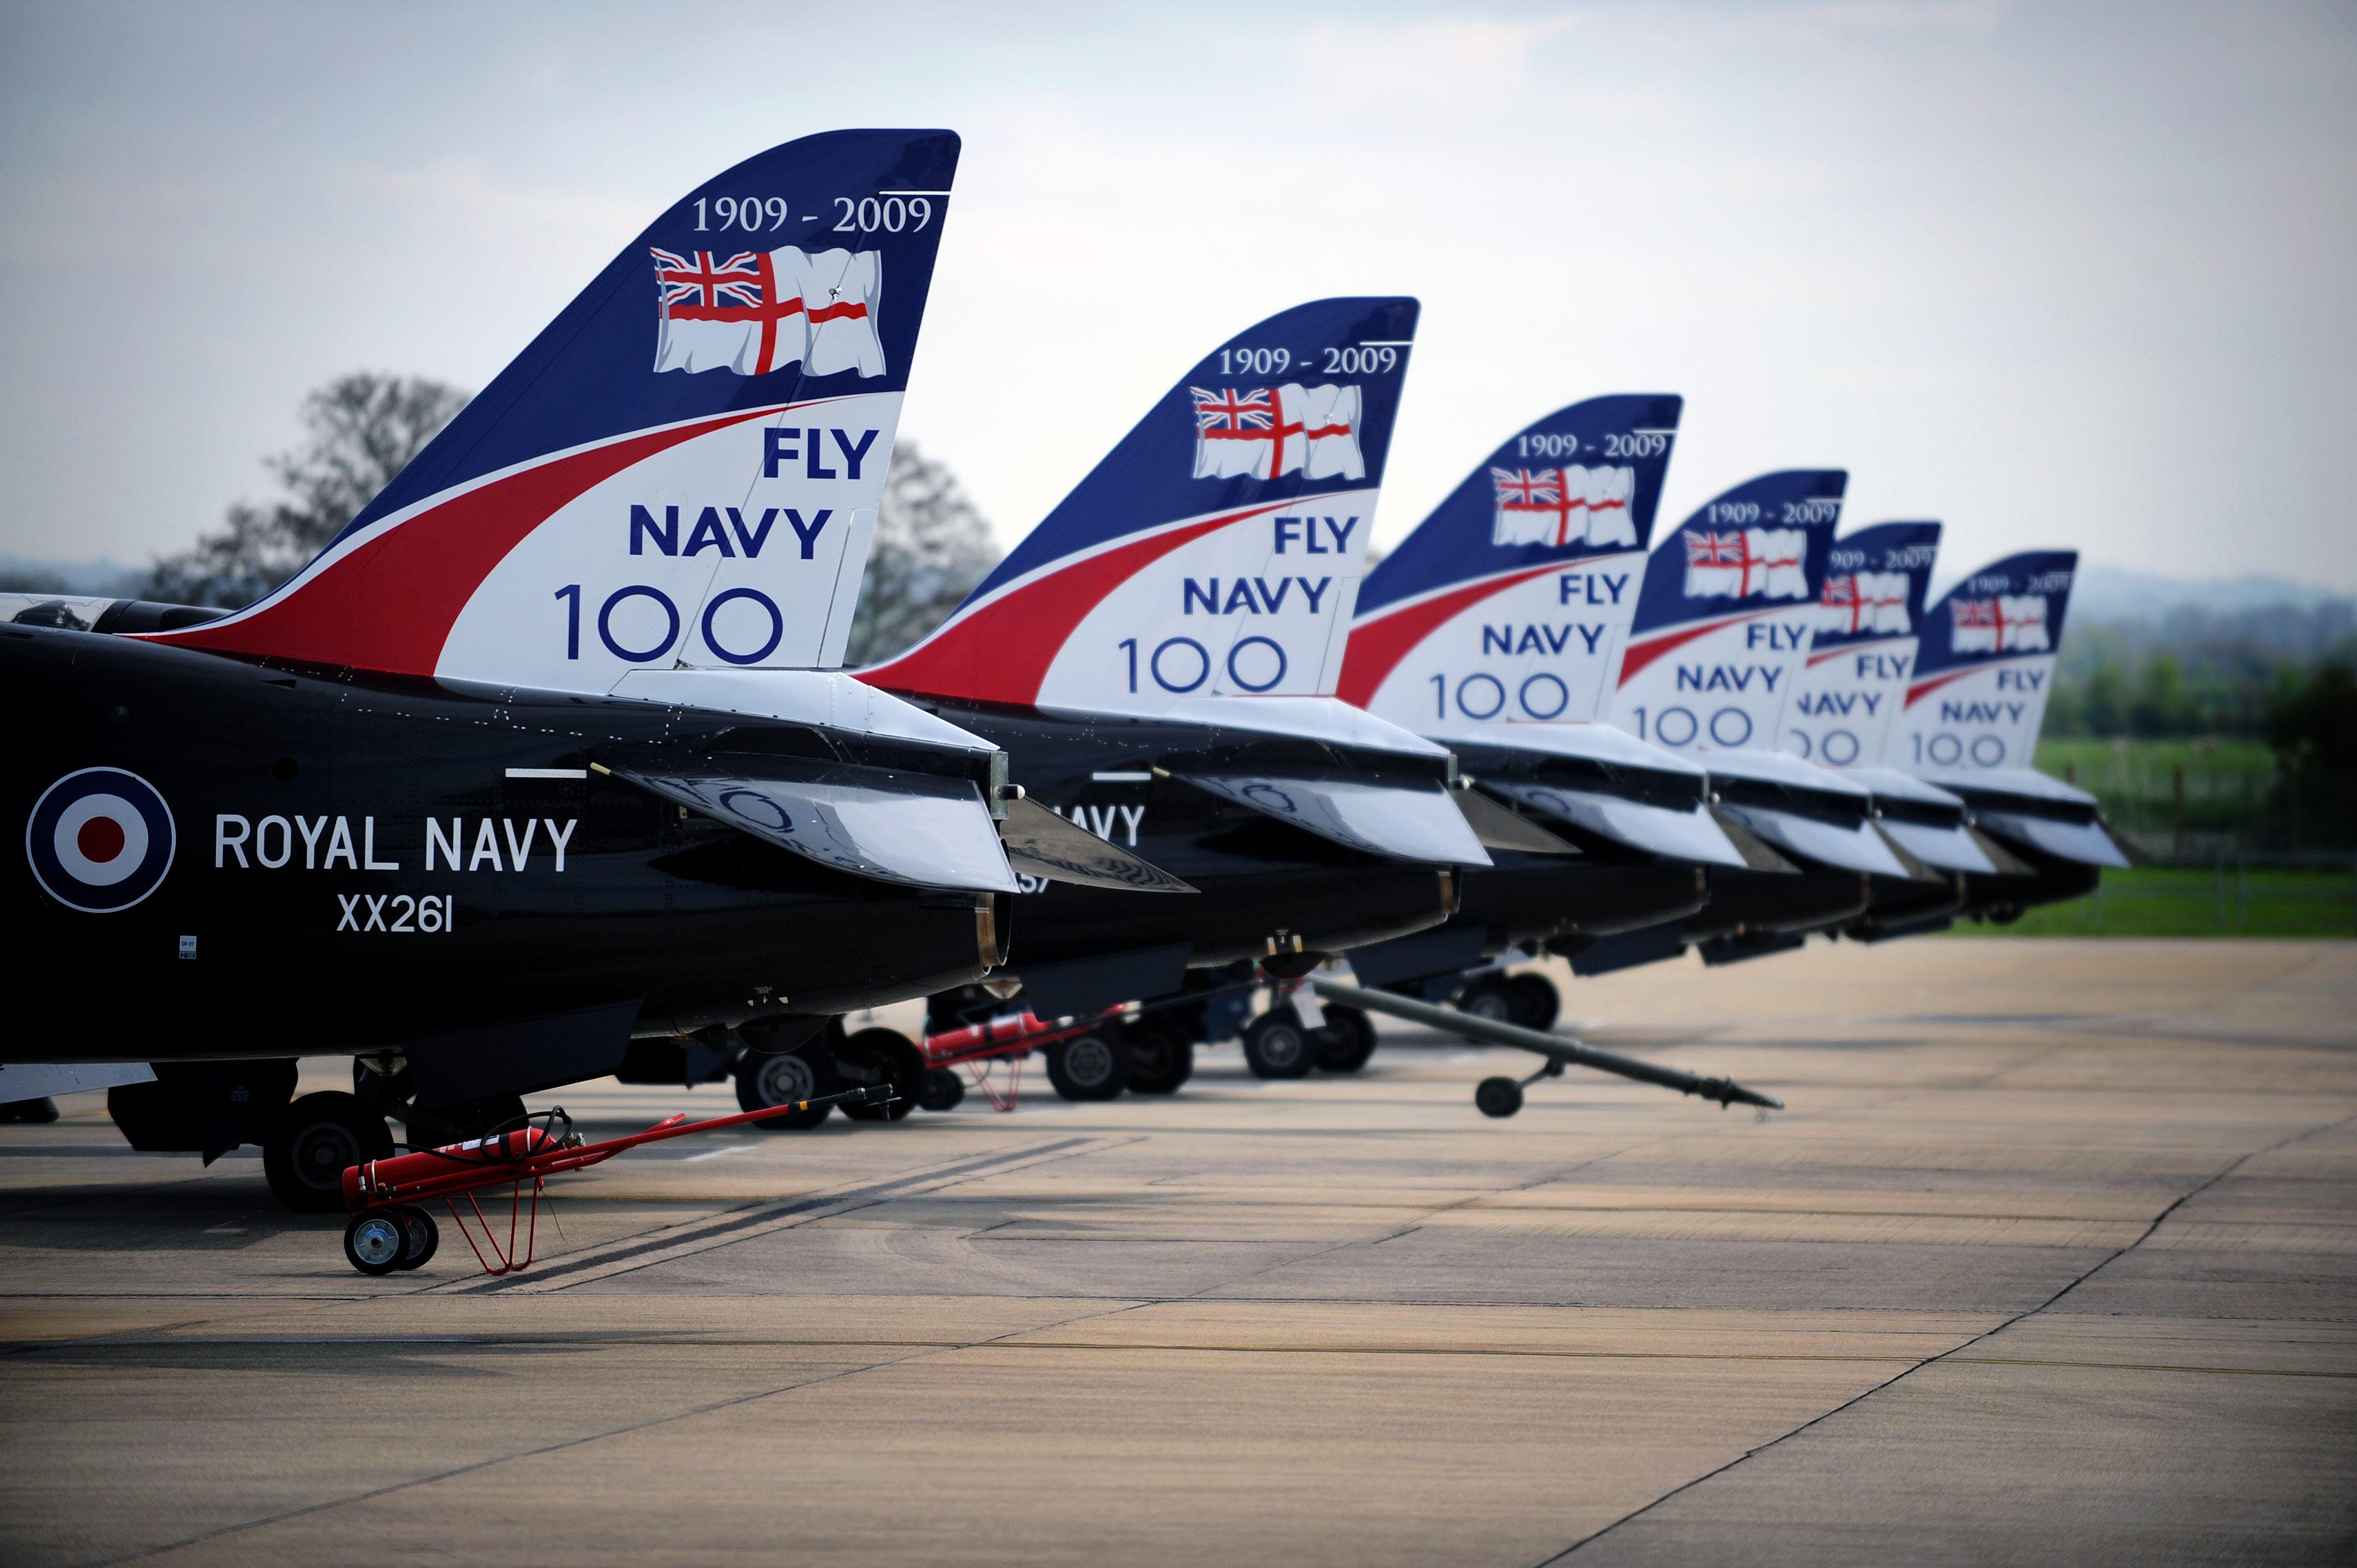 File:Fly Navy 100 Logos on Hawk Aircraft at RNAS Yeovilton ...